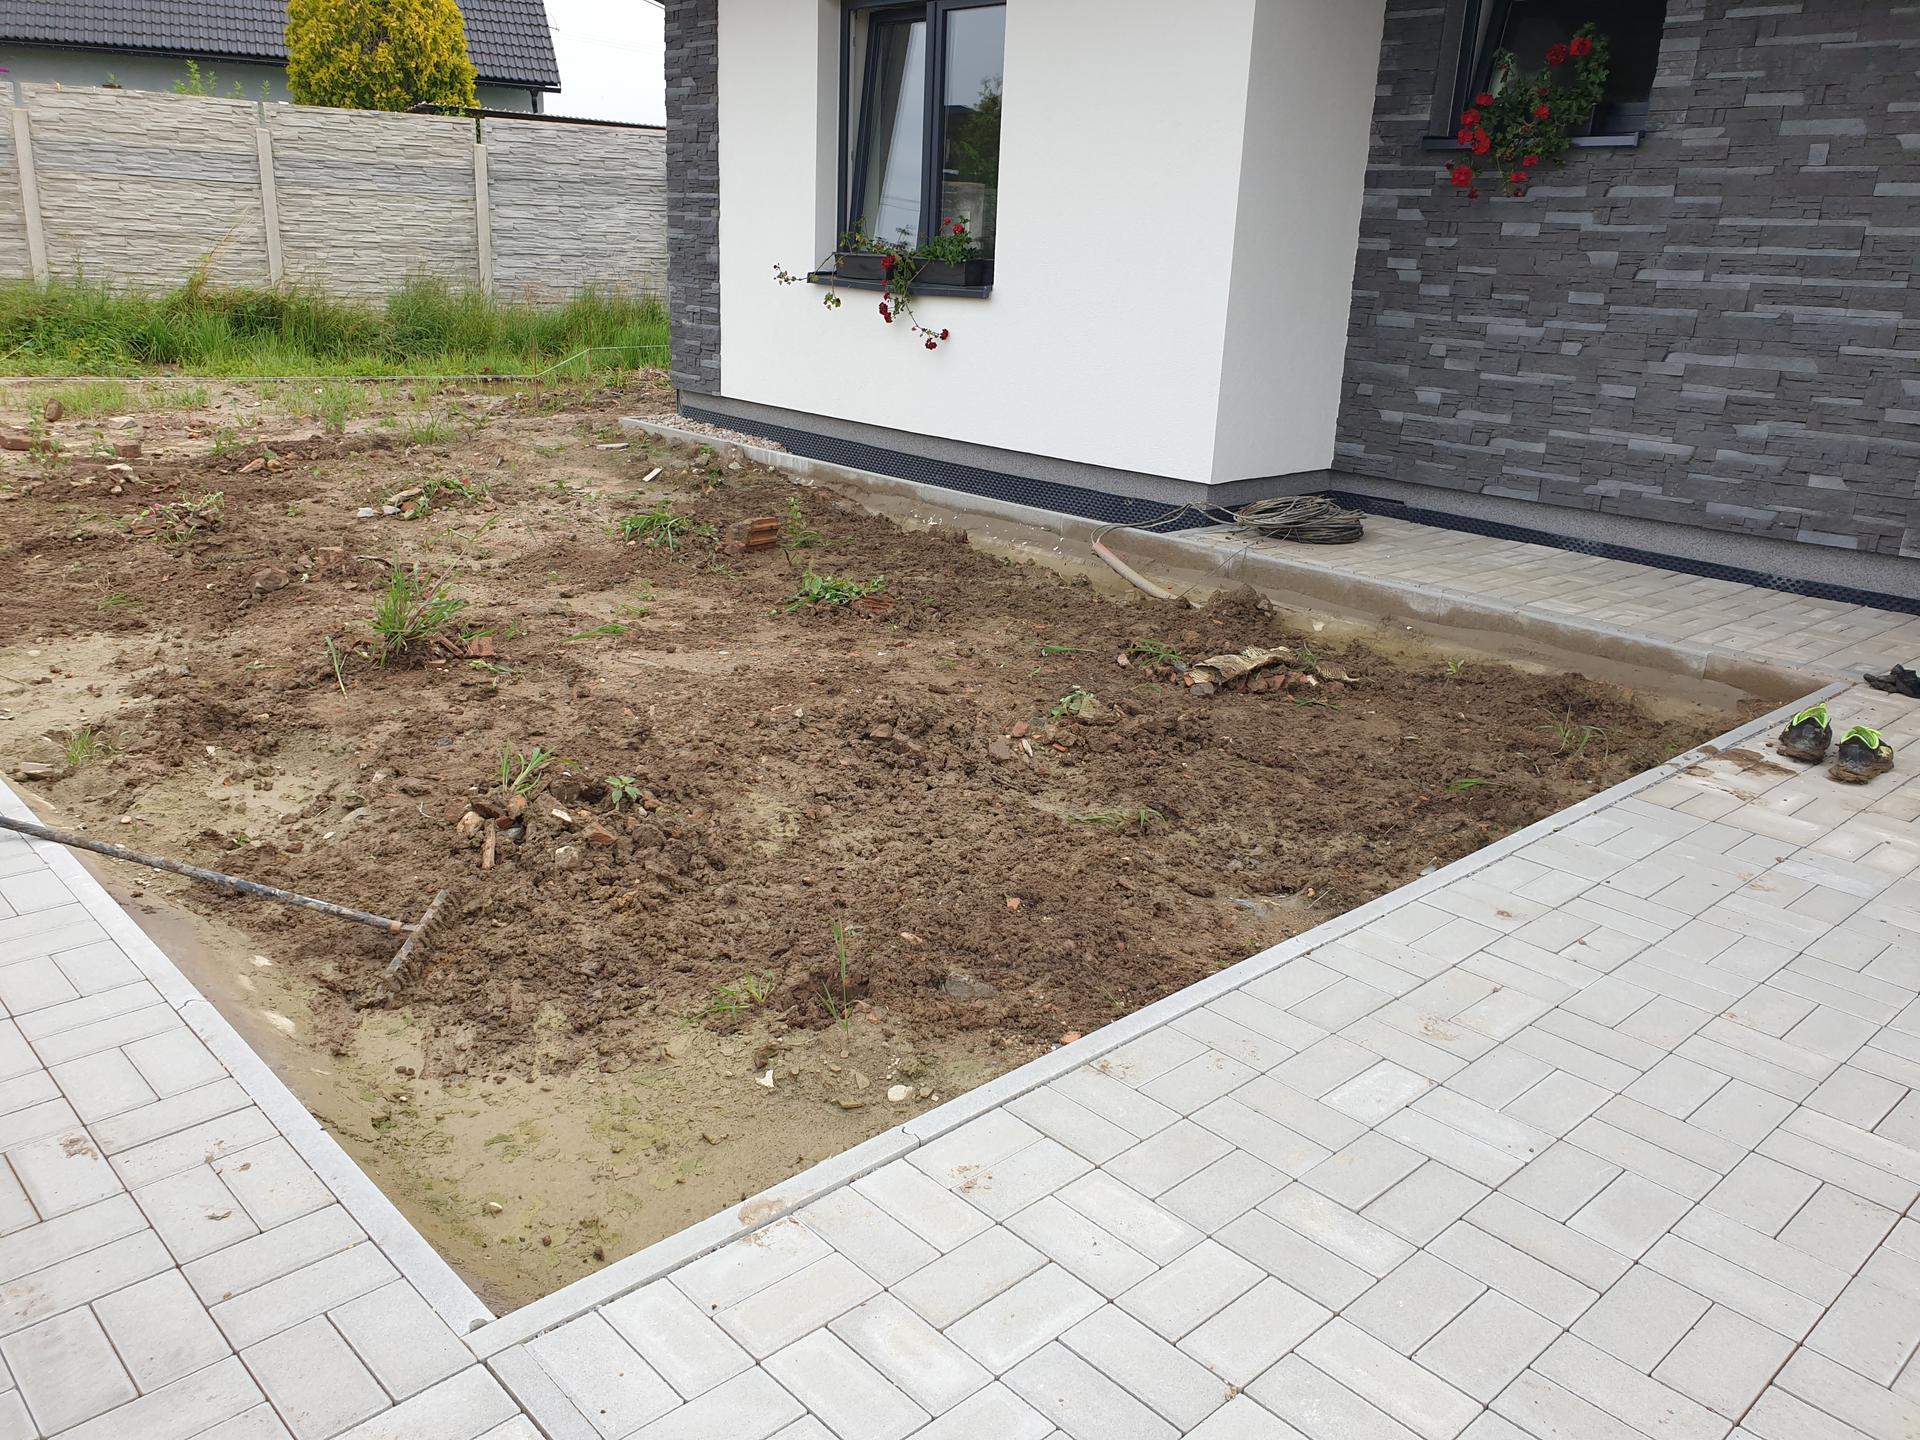 Zahrada a terasa - Obrázek č. 42